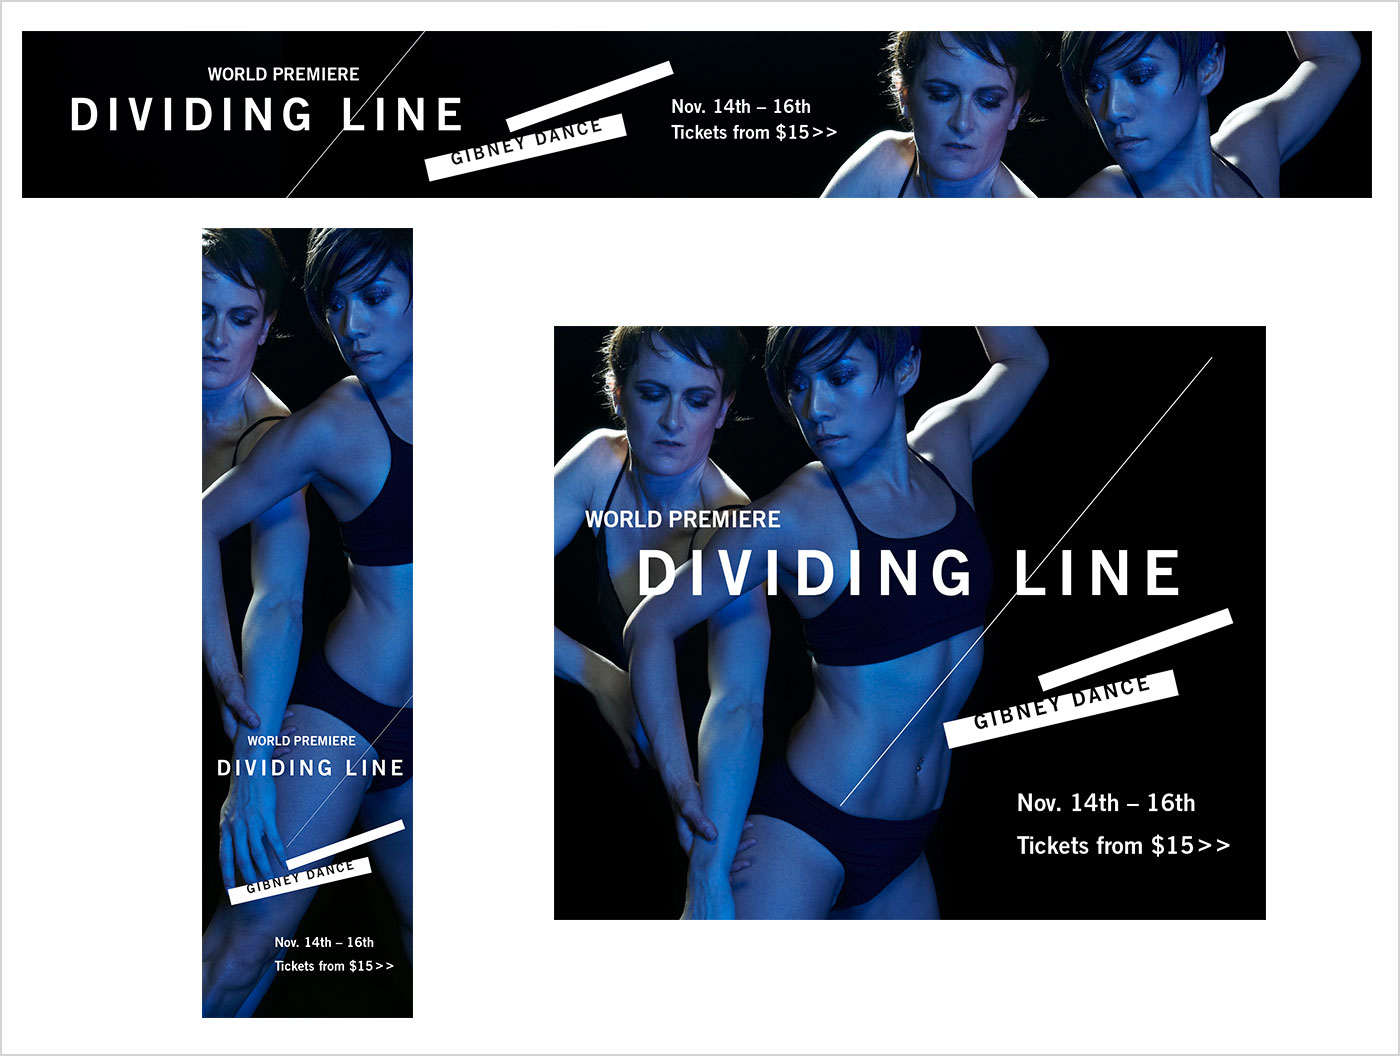 GIbney Dance - padraic | BRANDING + DESIGN